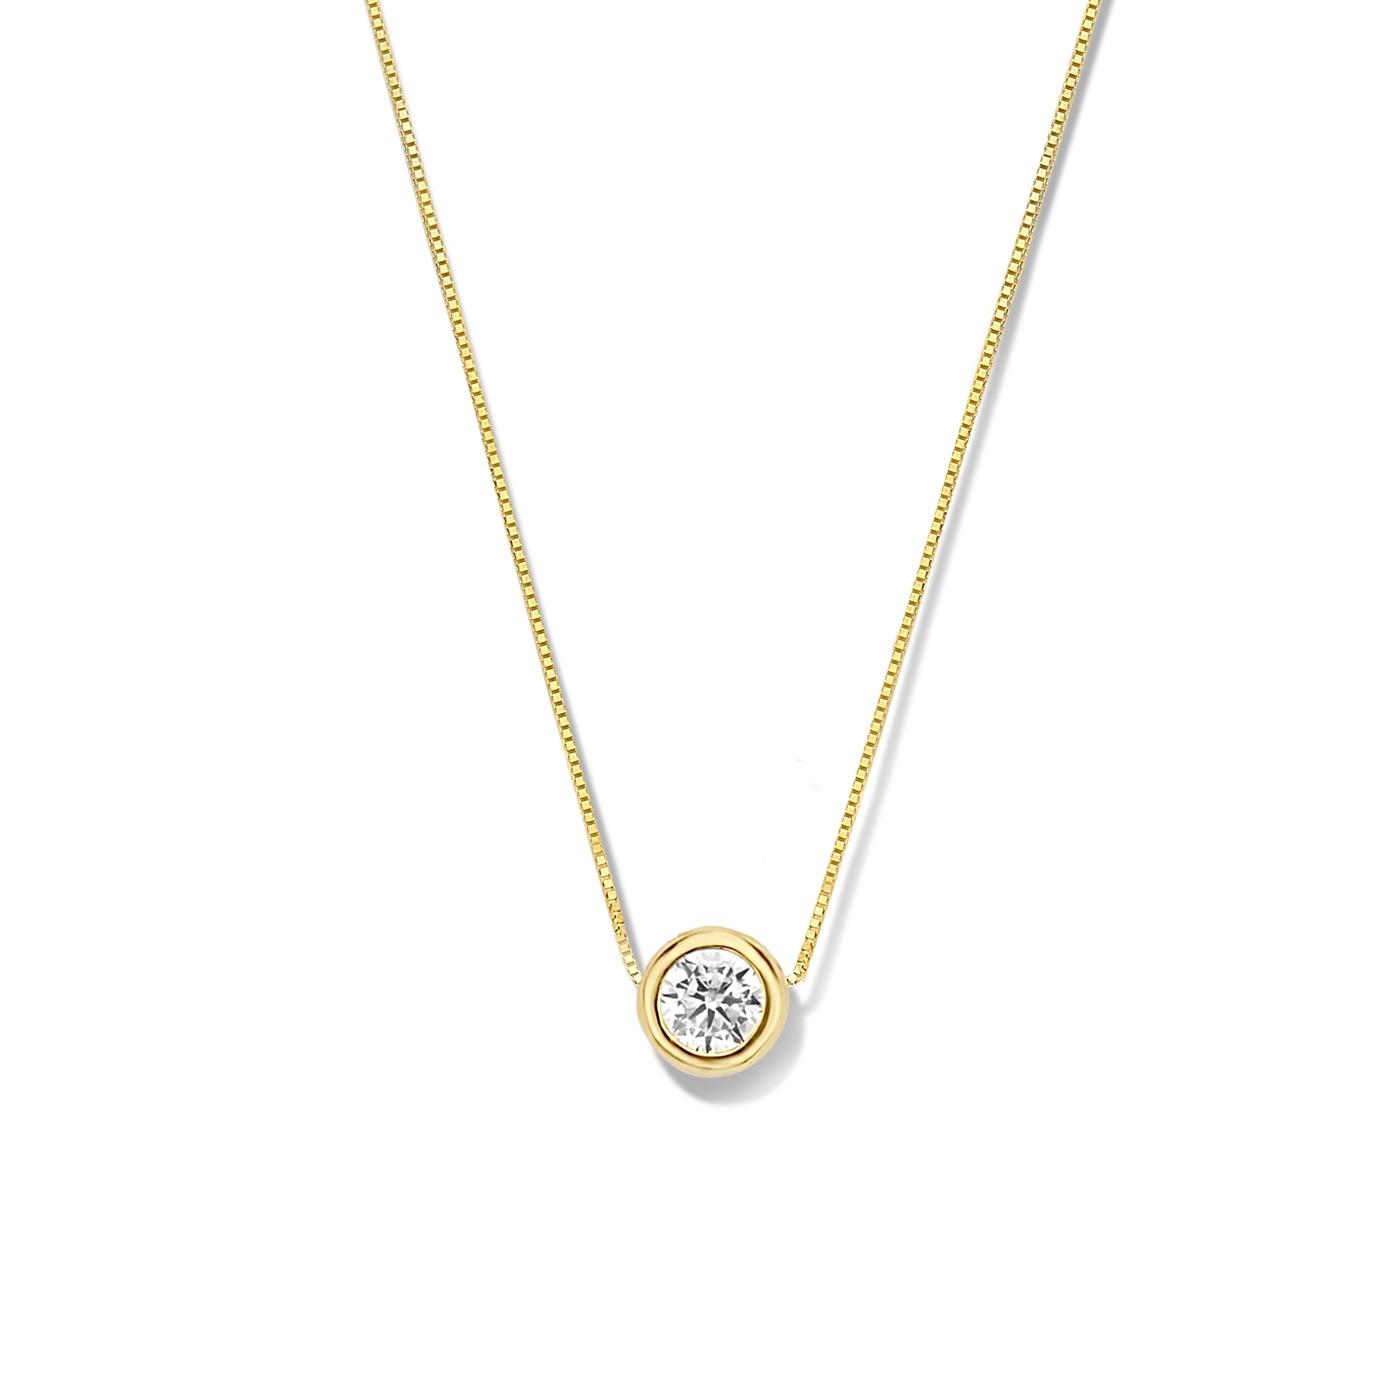 Isabel Bernard Le Marais Lison 14 karaat gouden collier zirkonia